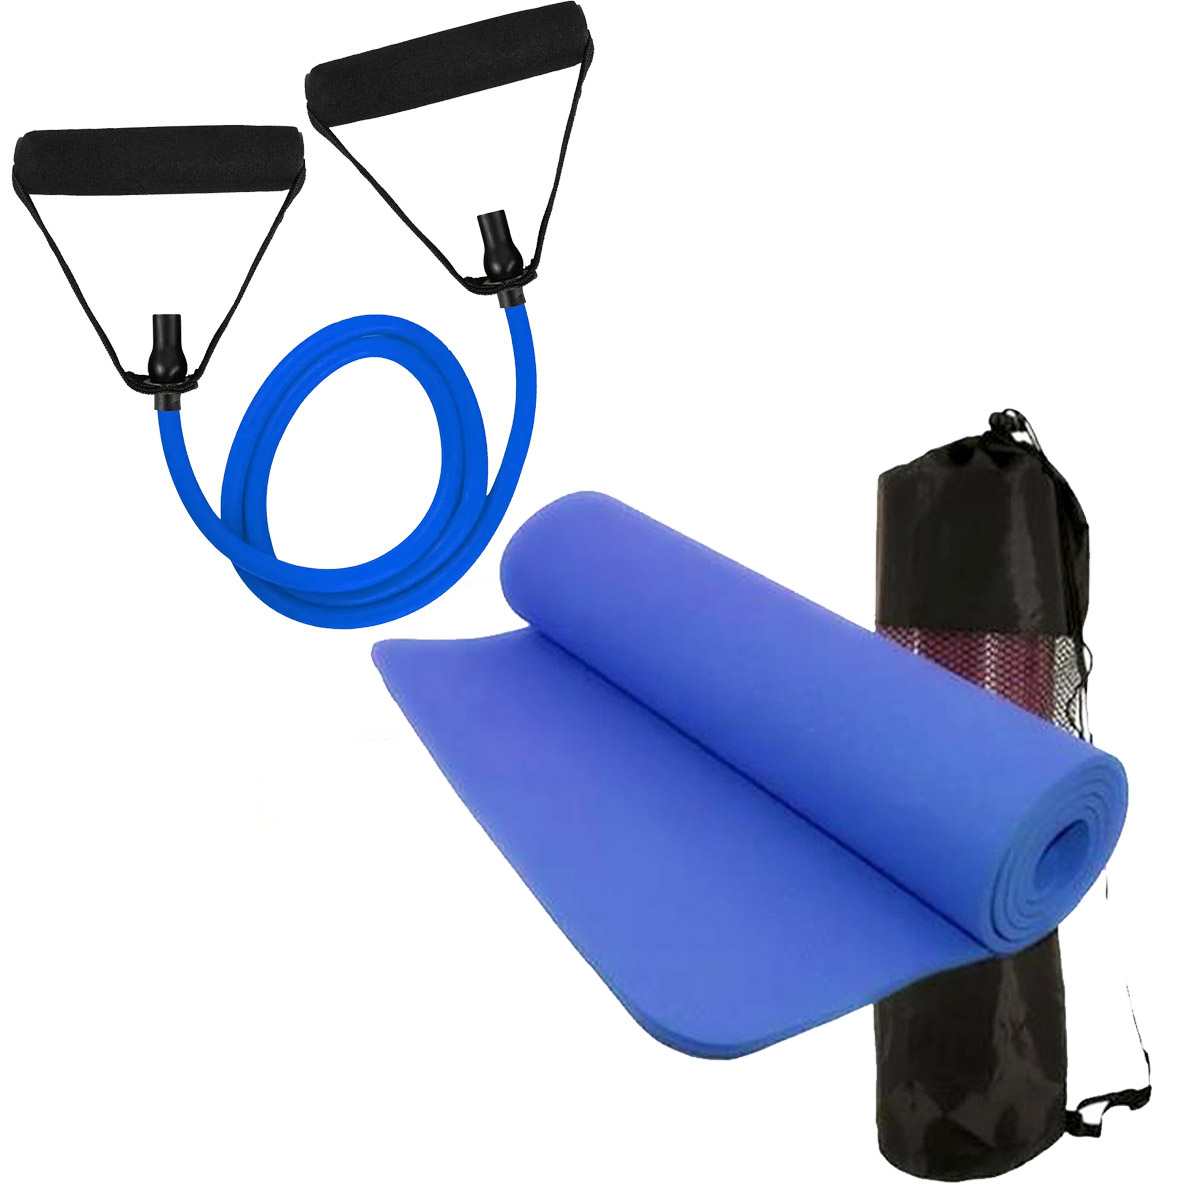 Kit Tapete de Yoga Azul Elástico Extensor Tensão MBfit